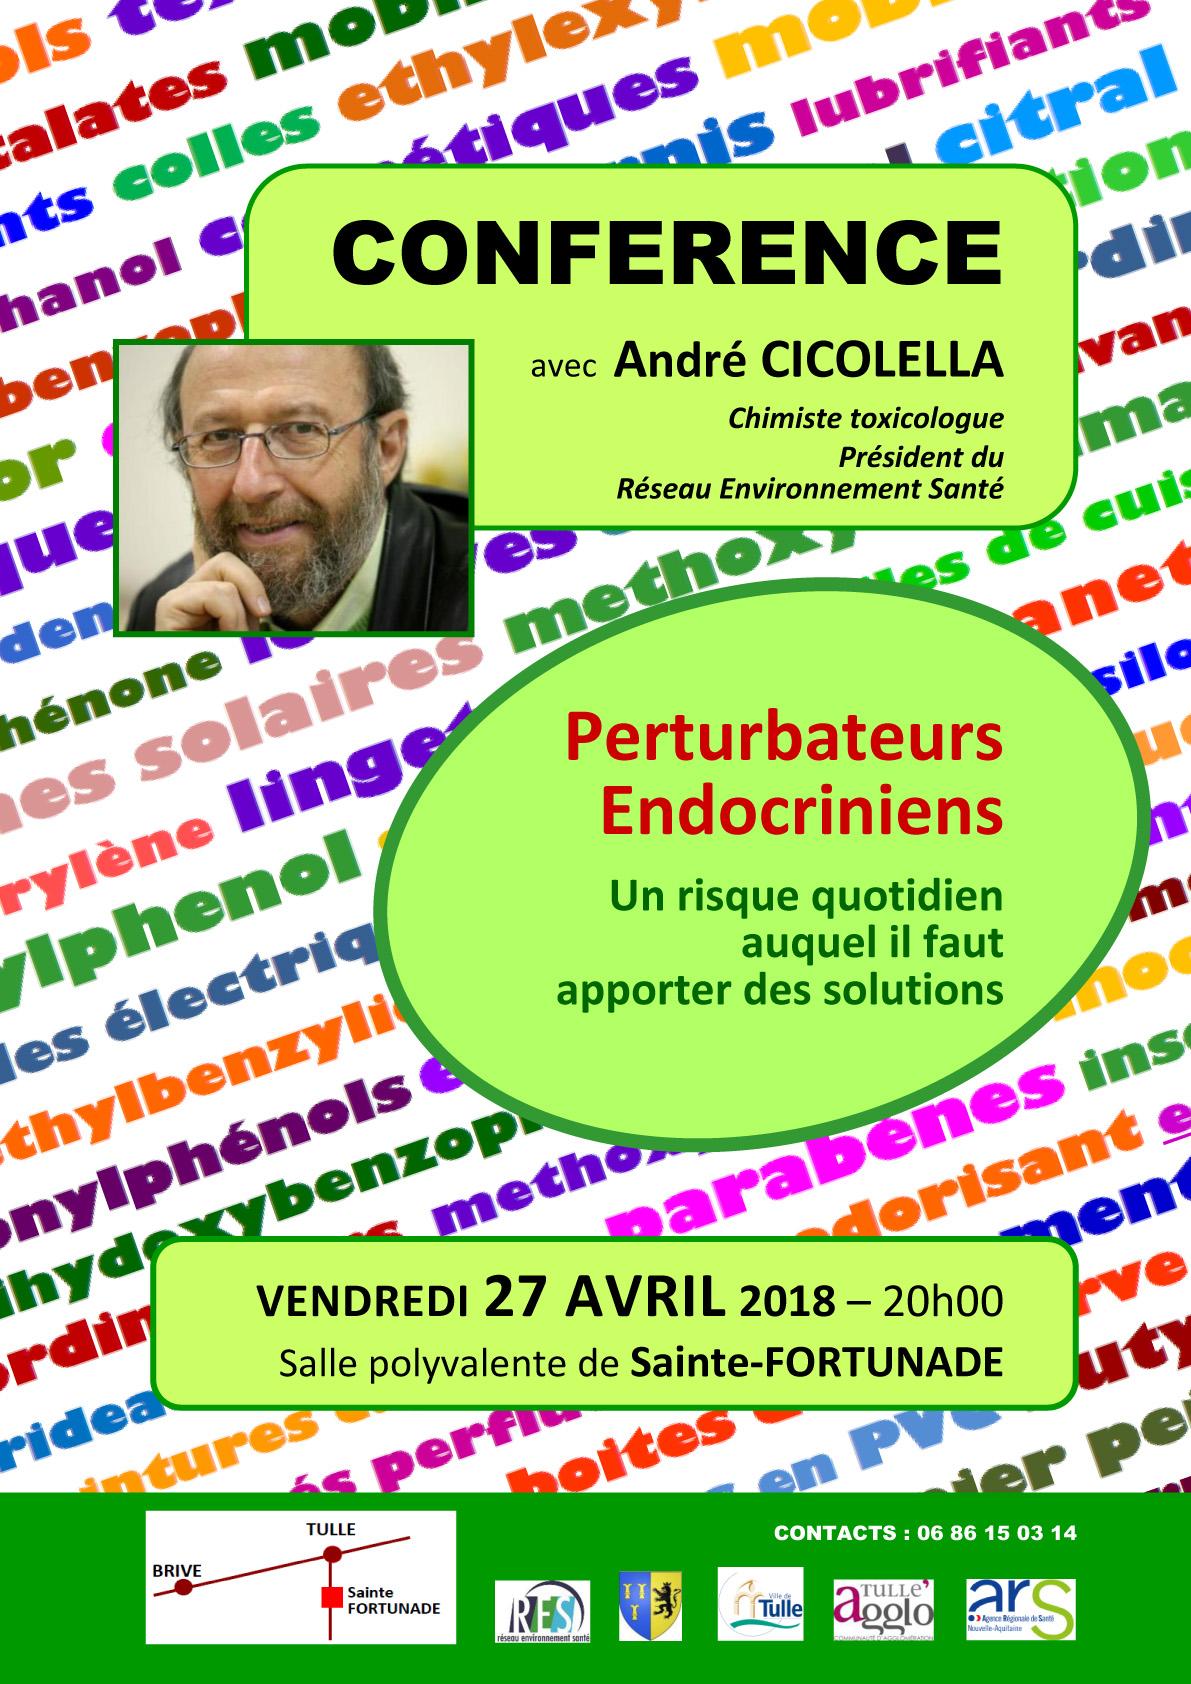 Conférence perturbateurs endocriniens Ste Fortunade André Cicolella